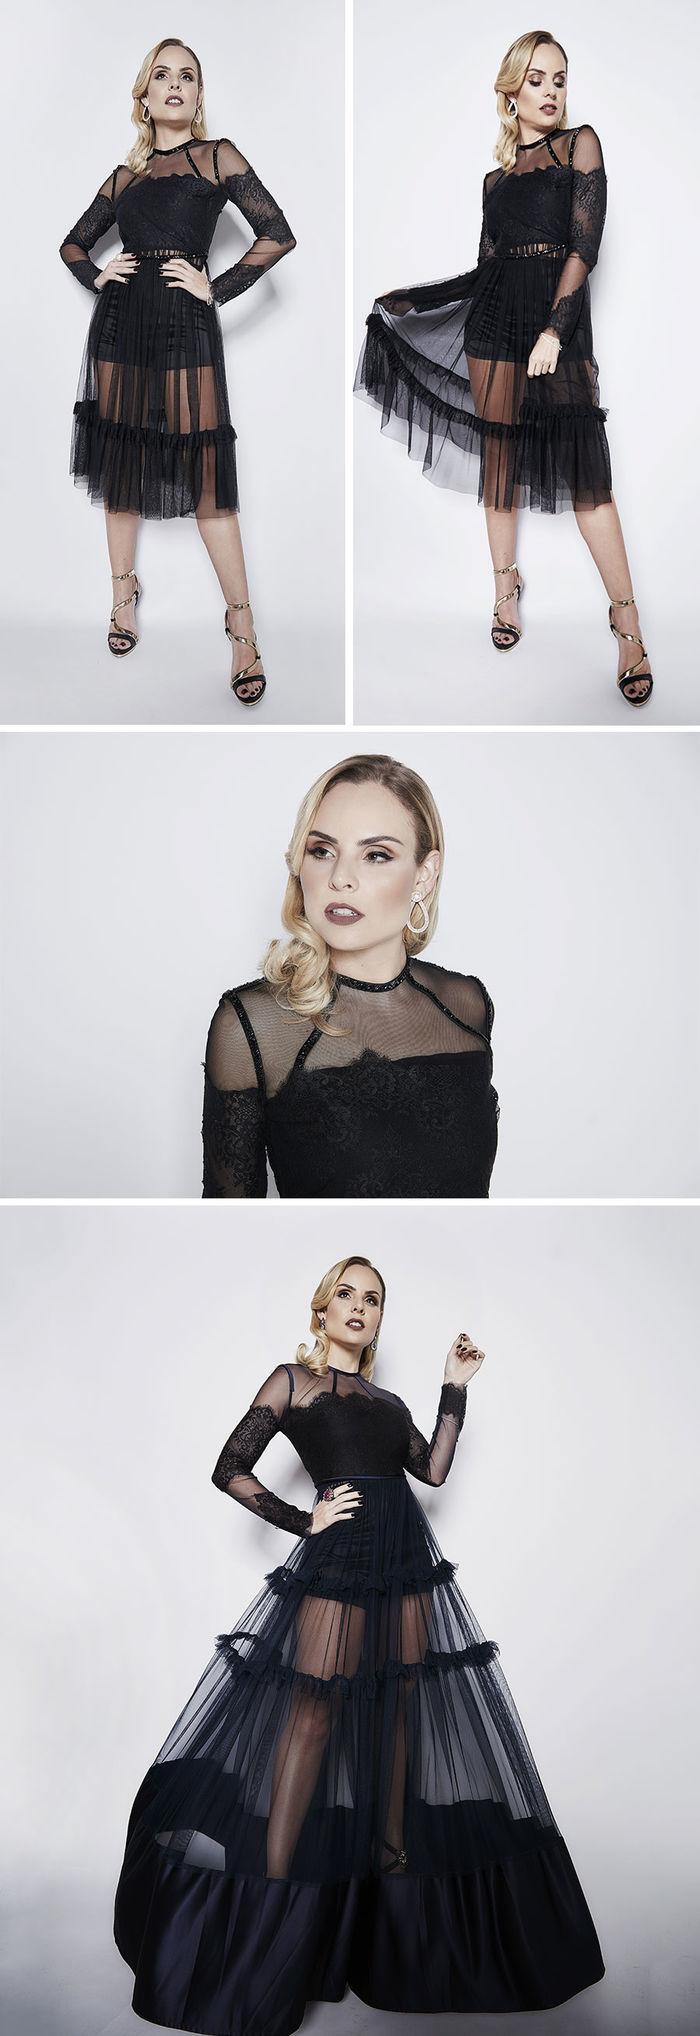 5 anos blog Layla Monteiro ensaio fotos minimalismo vestido preto de tule